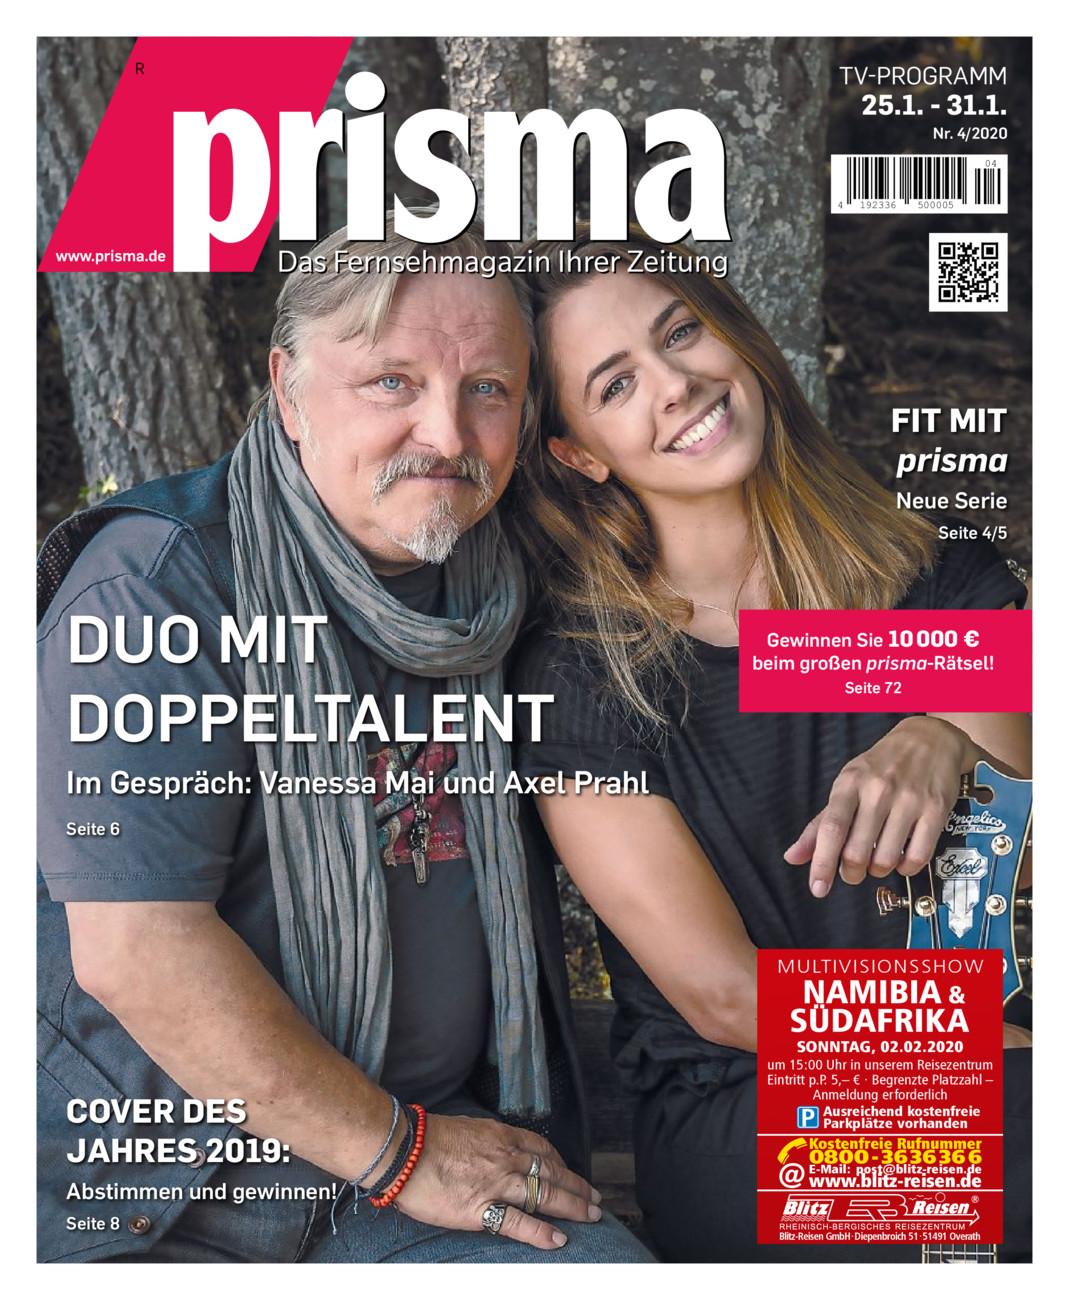 Prisma 25. - 31.1